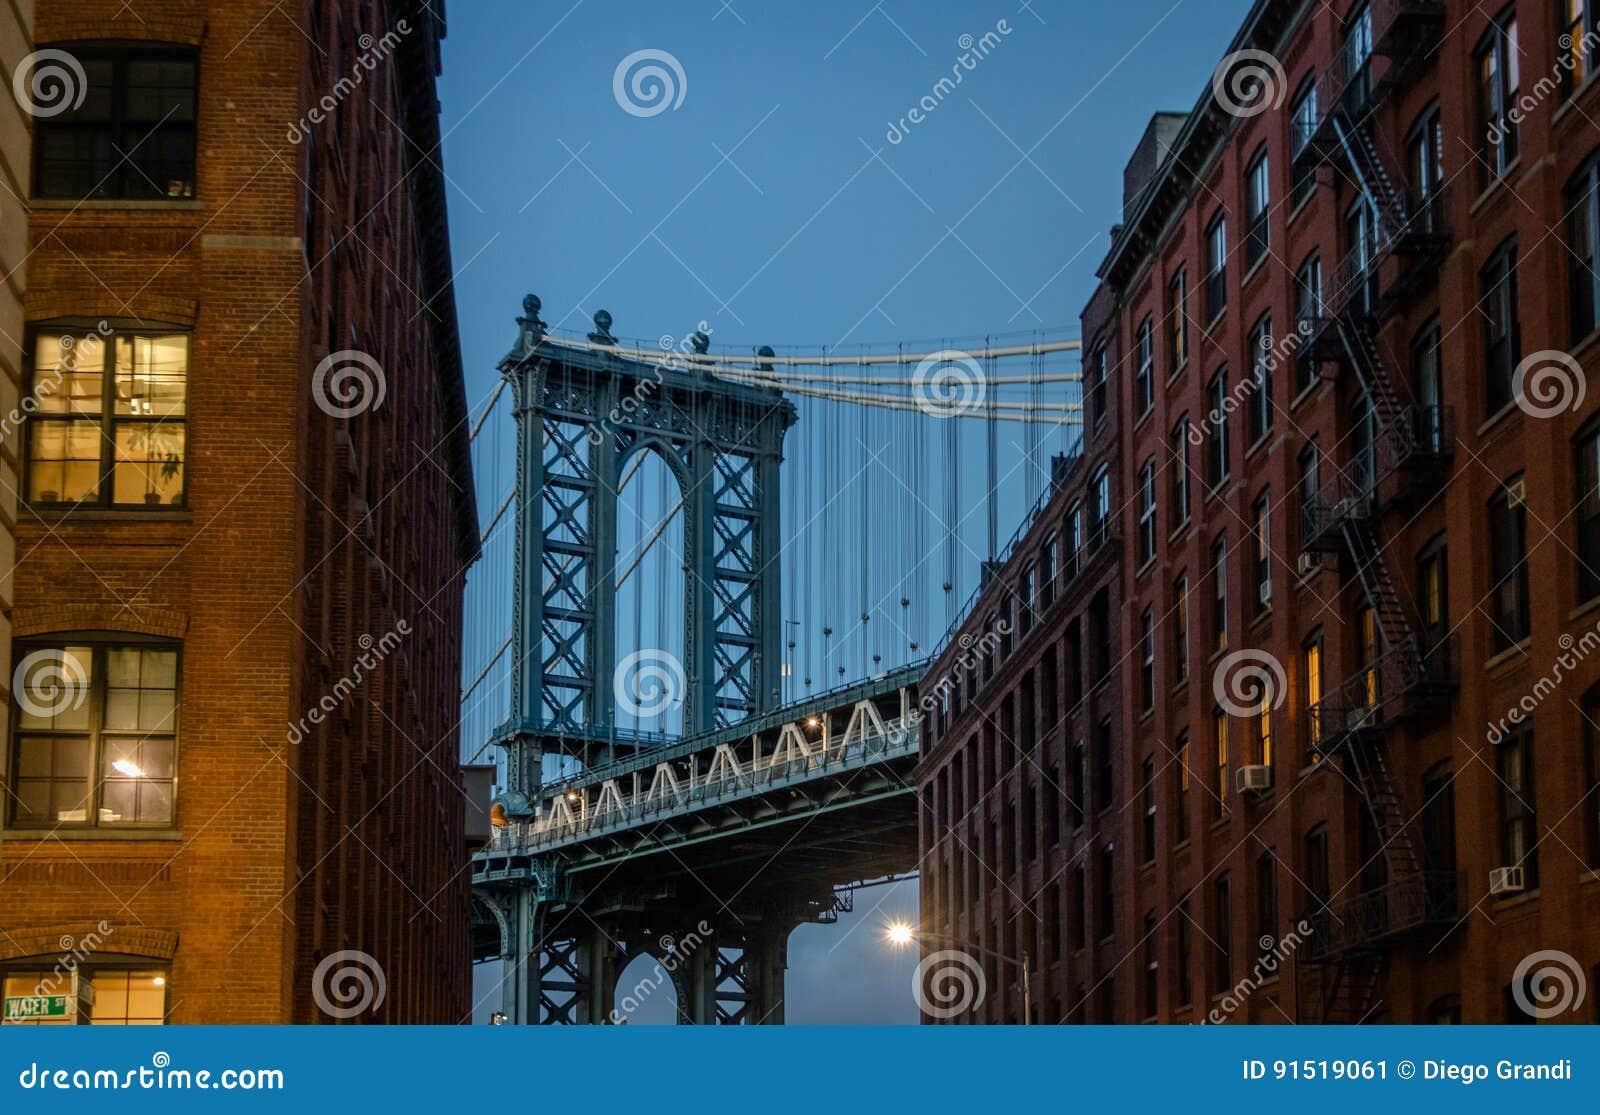 Manhattan Bridge seen from Dumbo between brick buildings on Brooklyn at sunset - New York, USA